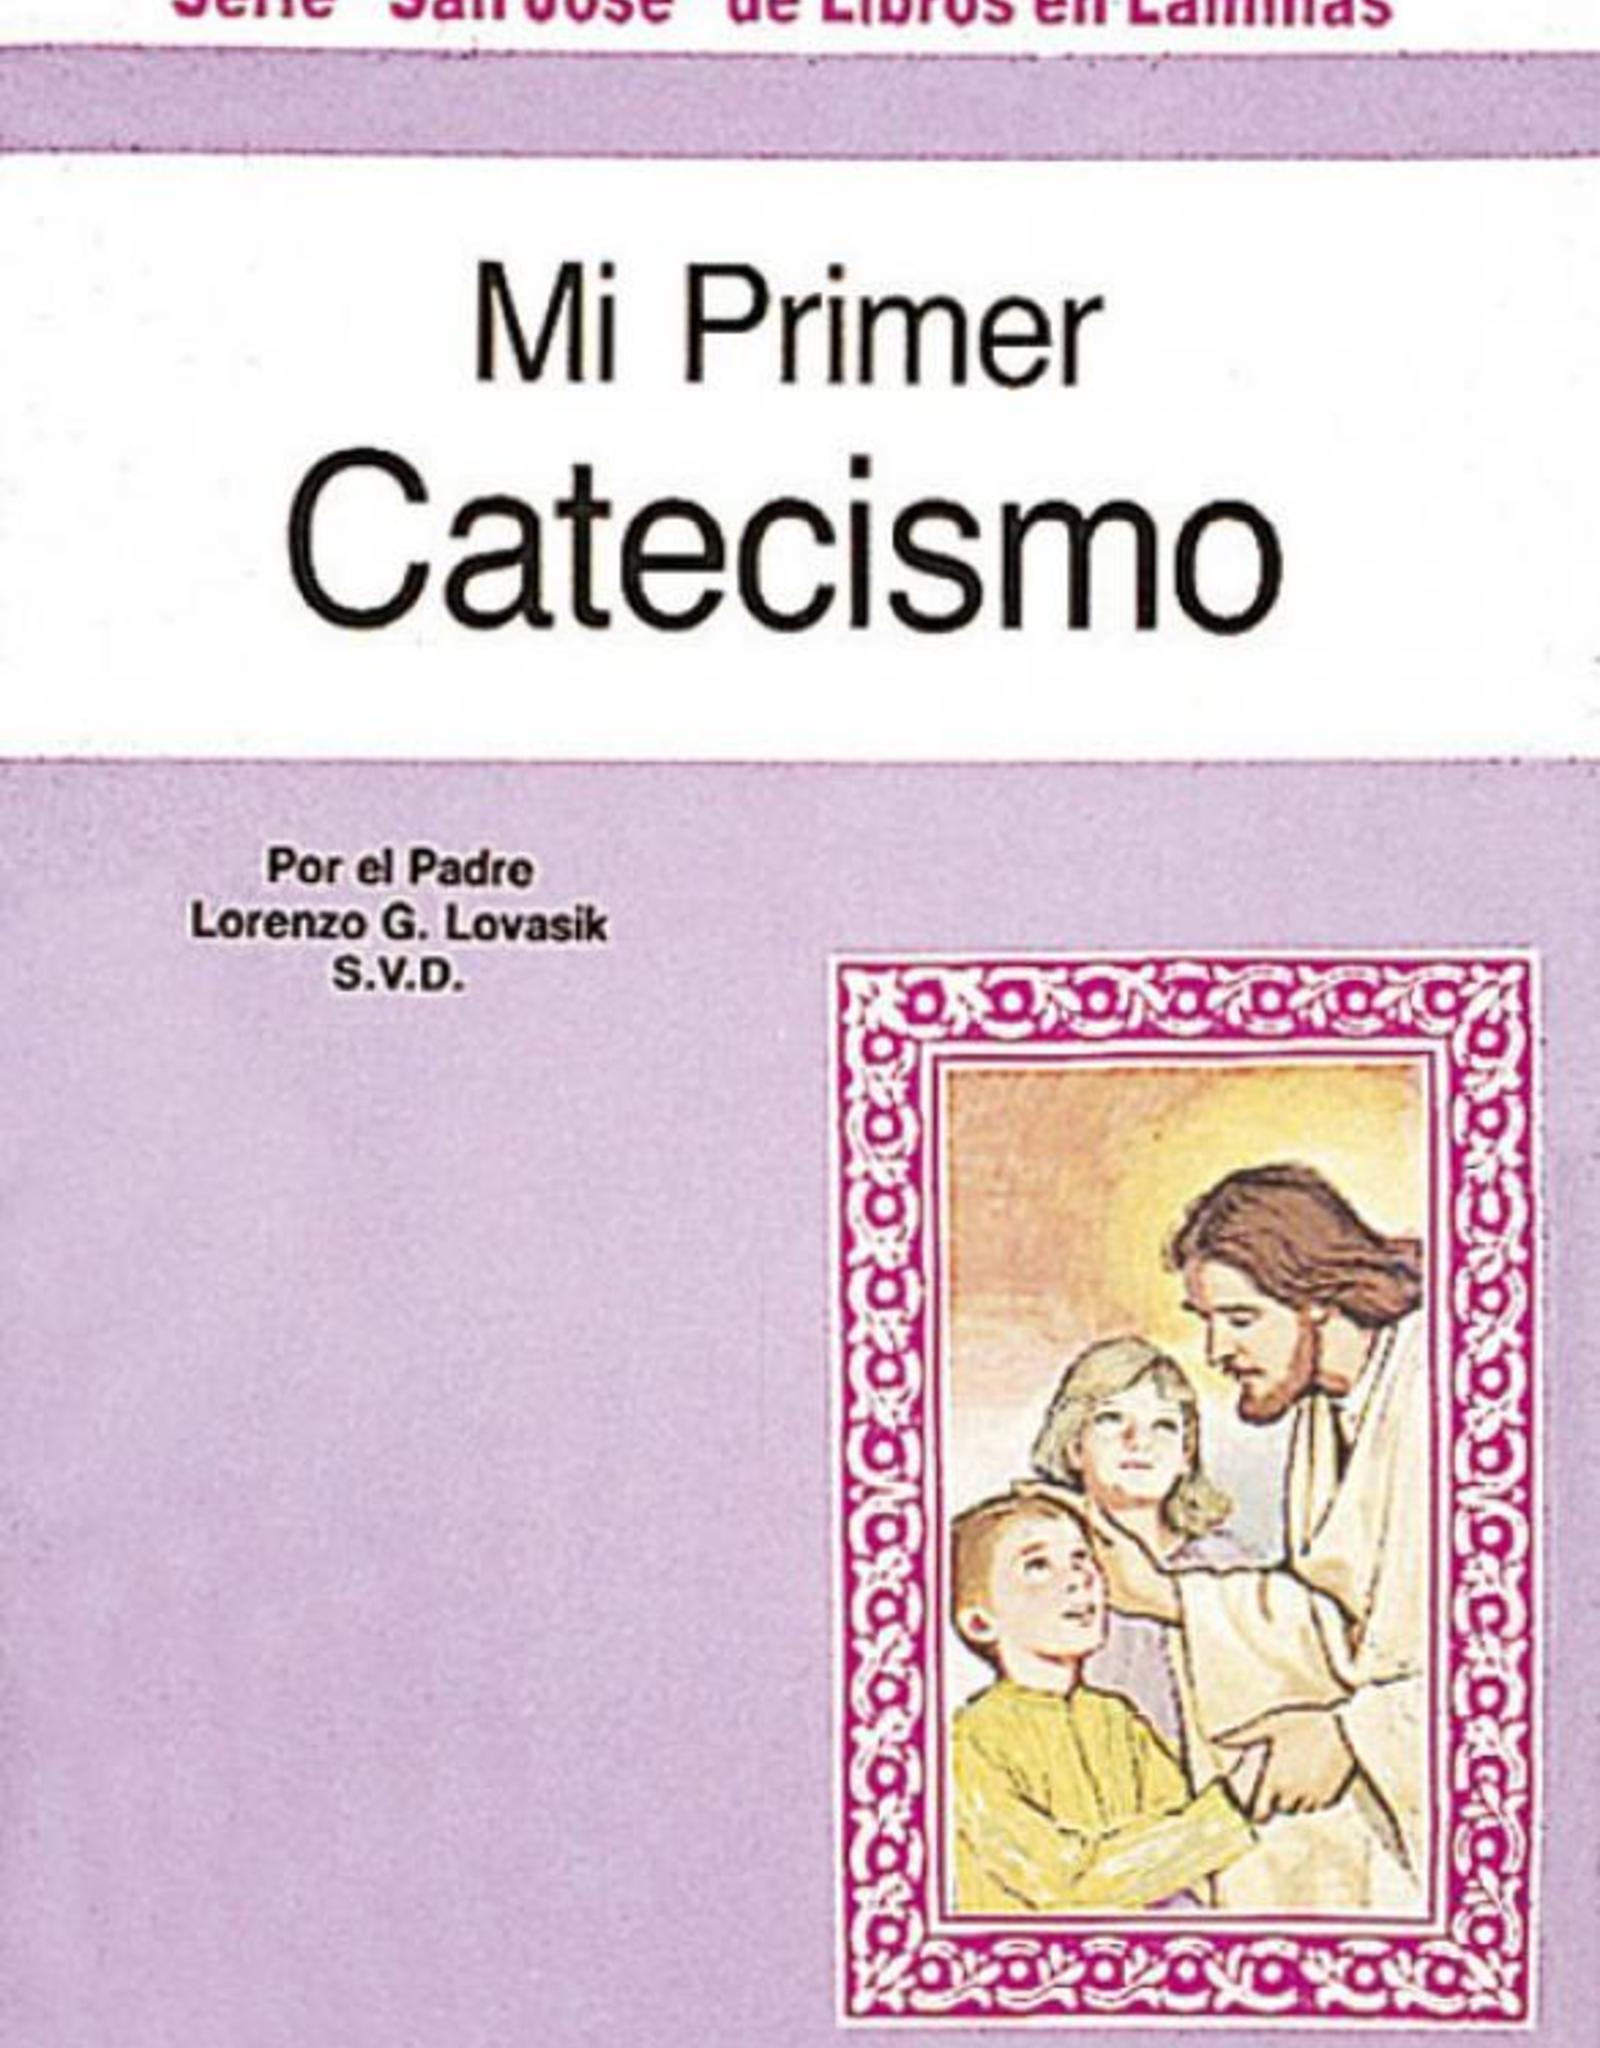 Catholic Book Publishing Mi Primer Catecismo, Padre Lorenzo Lovasik